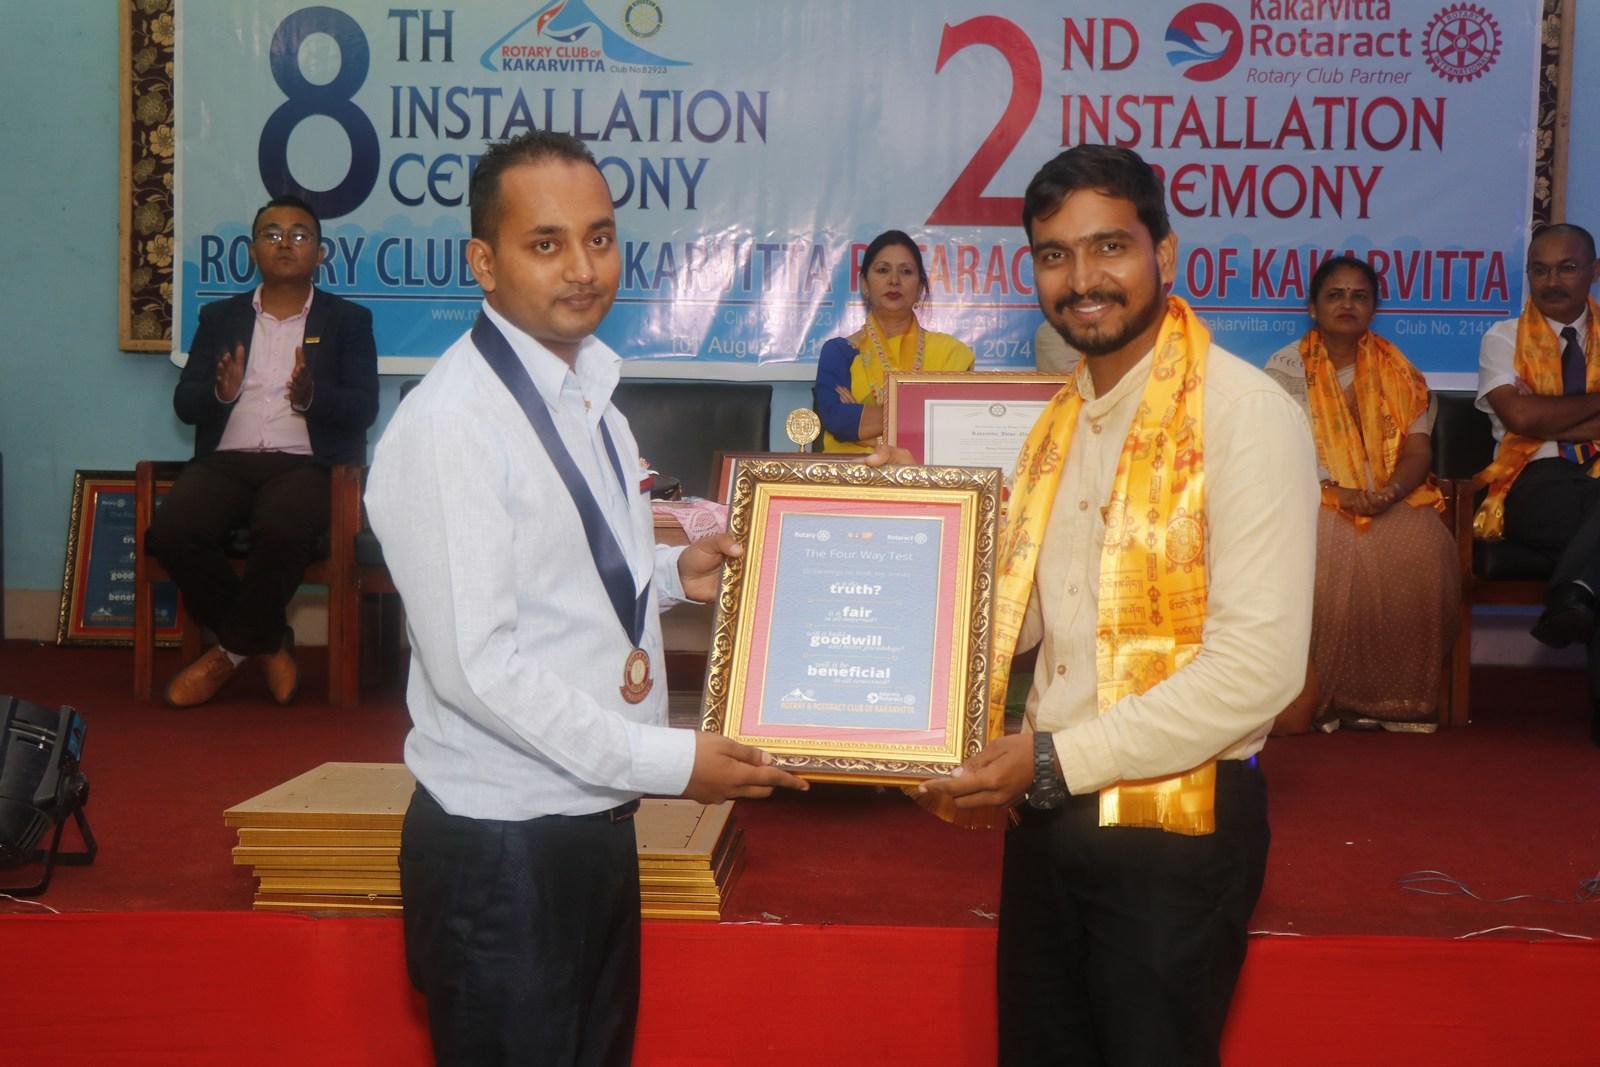 8th-Installation-Ceremony-Rotary-Club-of-Kakarvitta-109